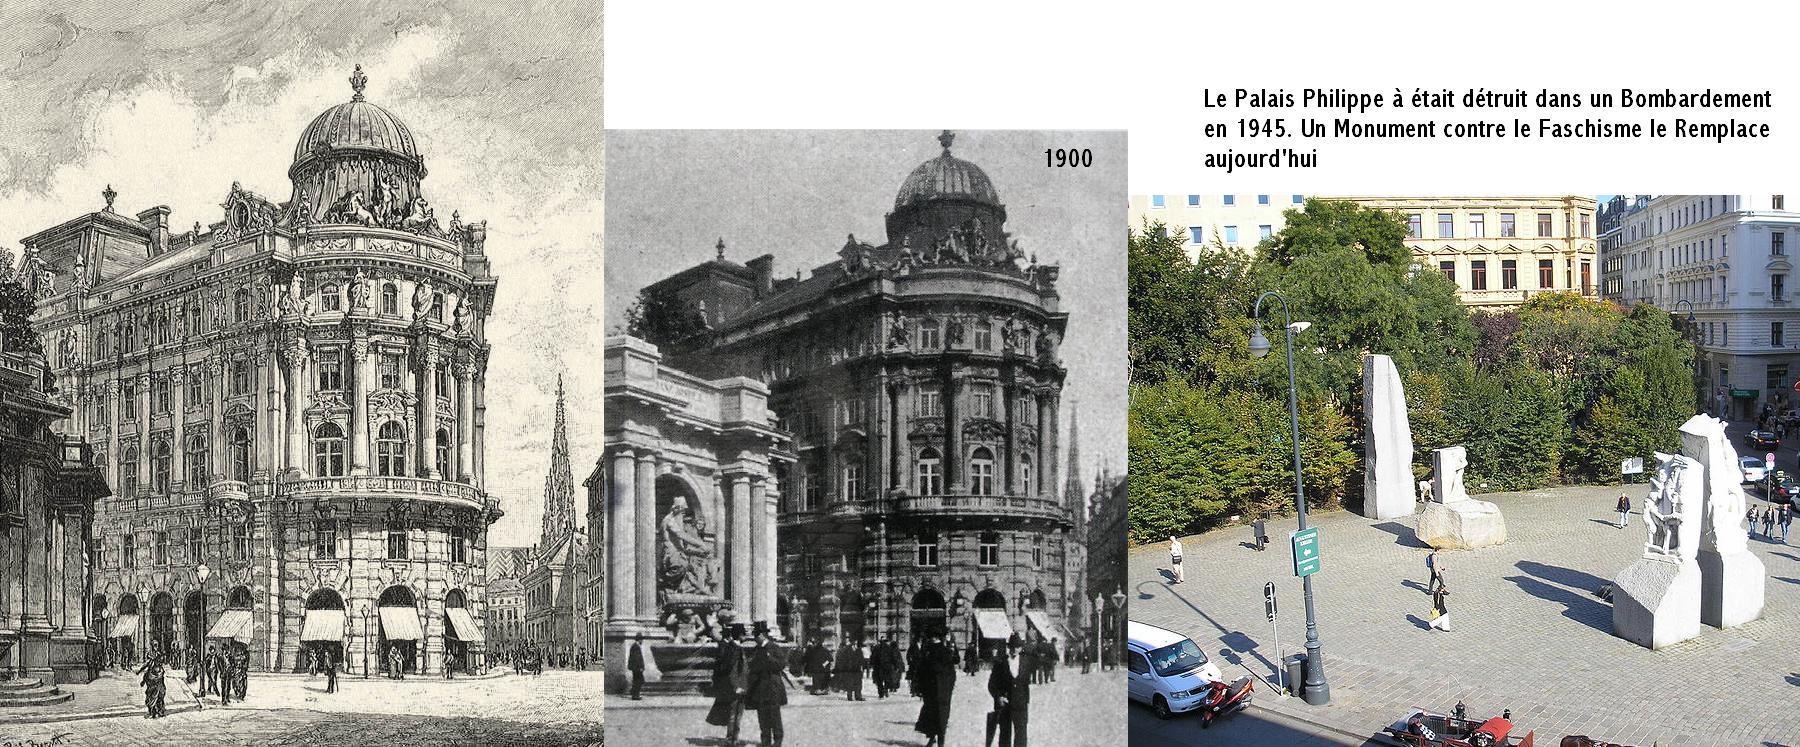 Palais Philippe 01